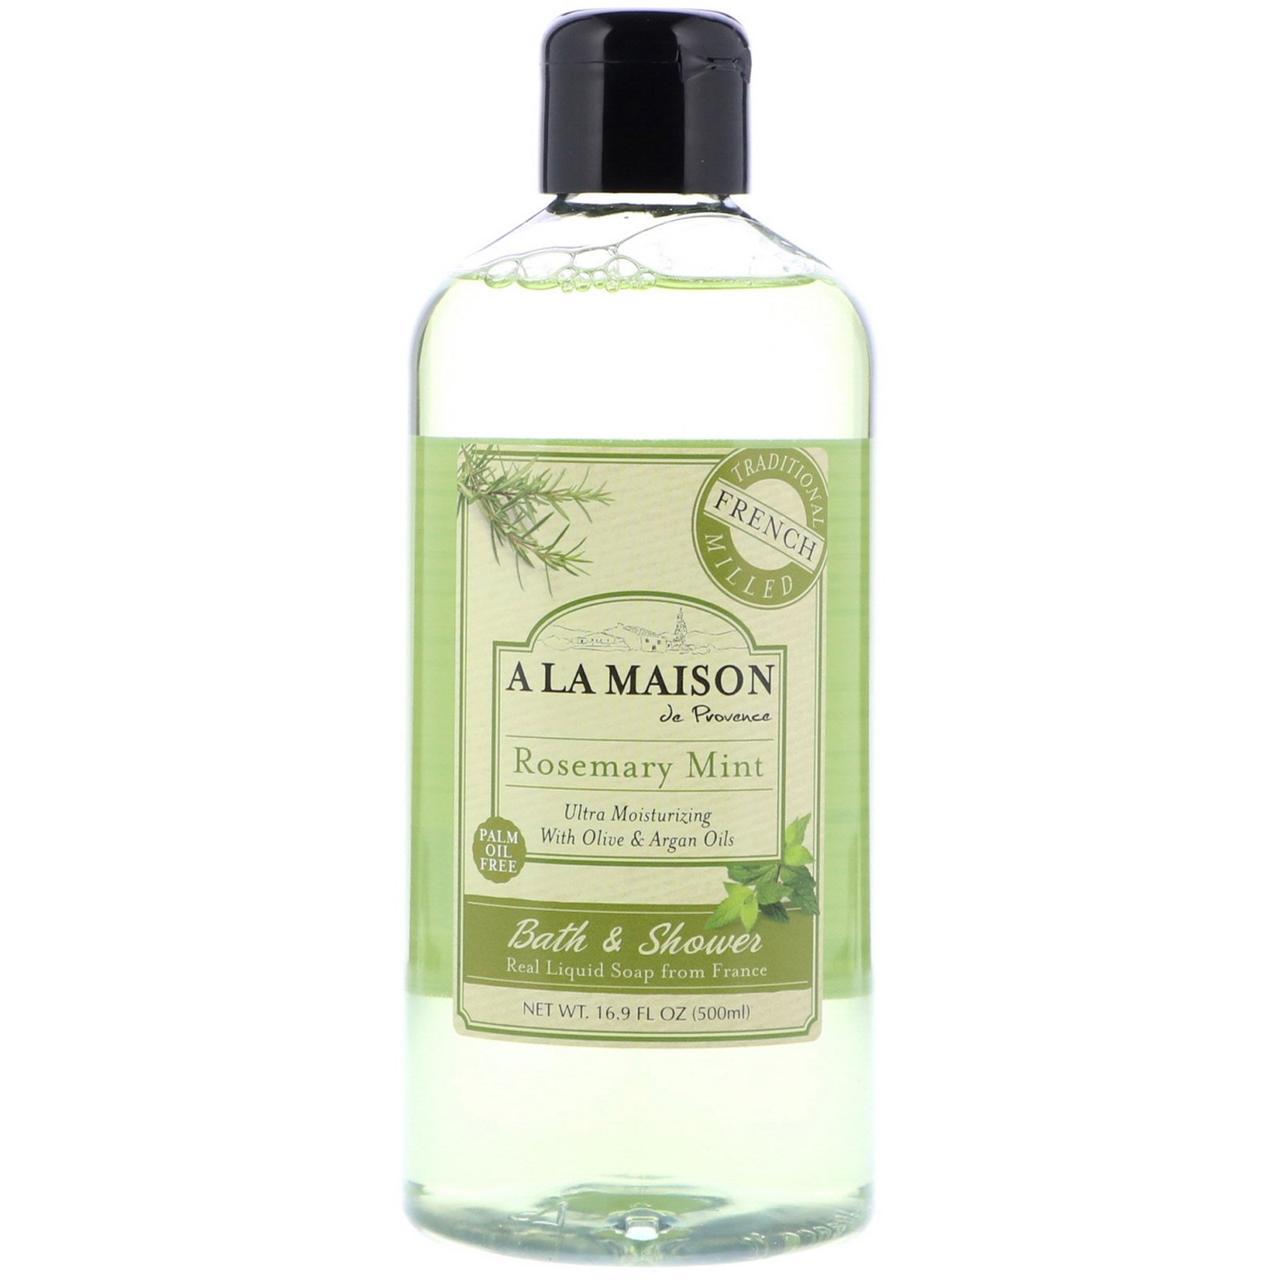 Жидкое мыло для душа, розмарин, A La Maison de Provence, 500 мл.